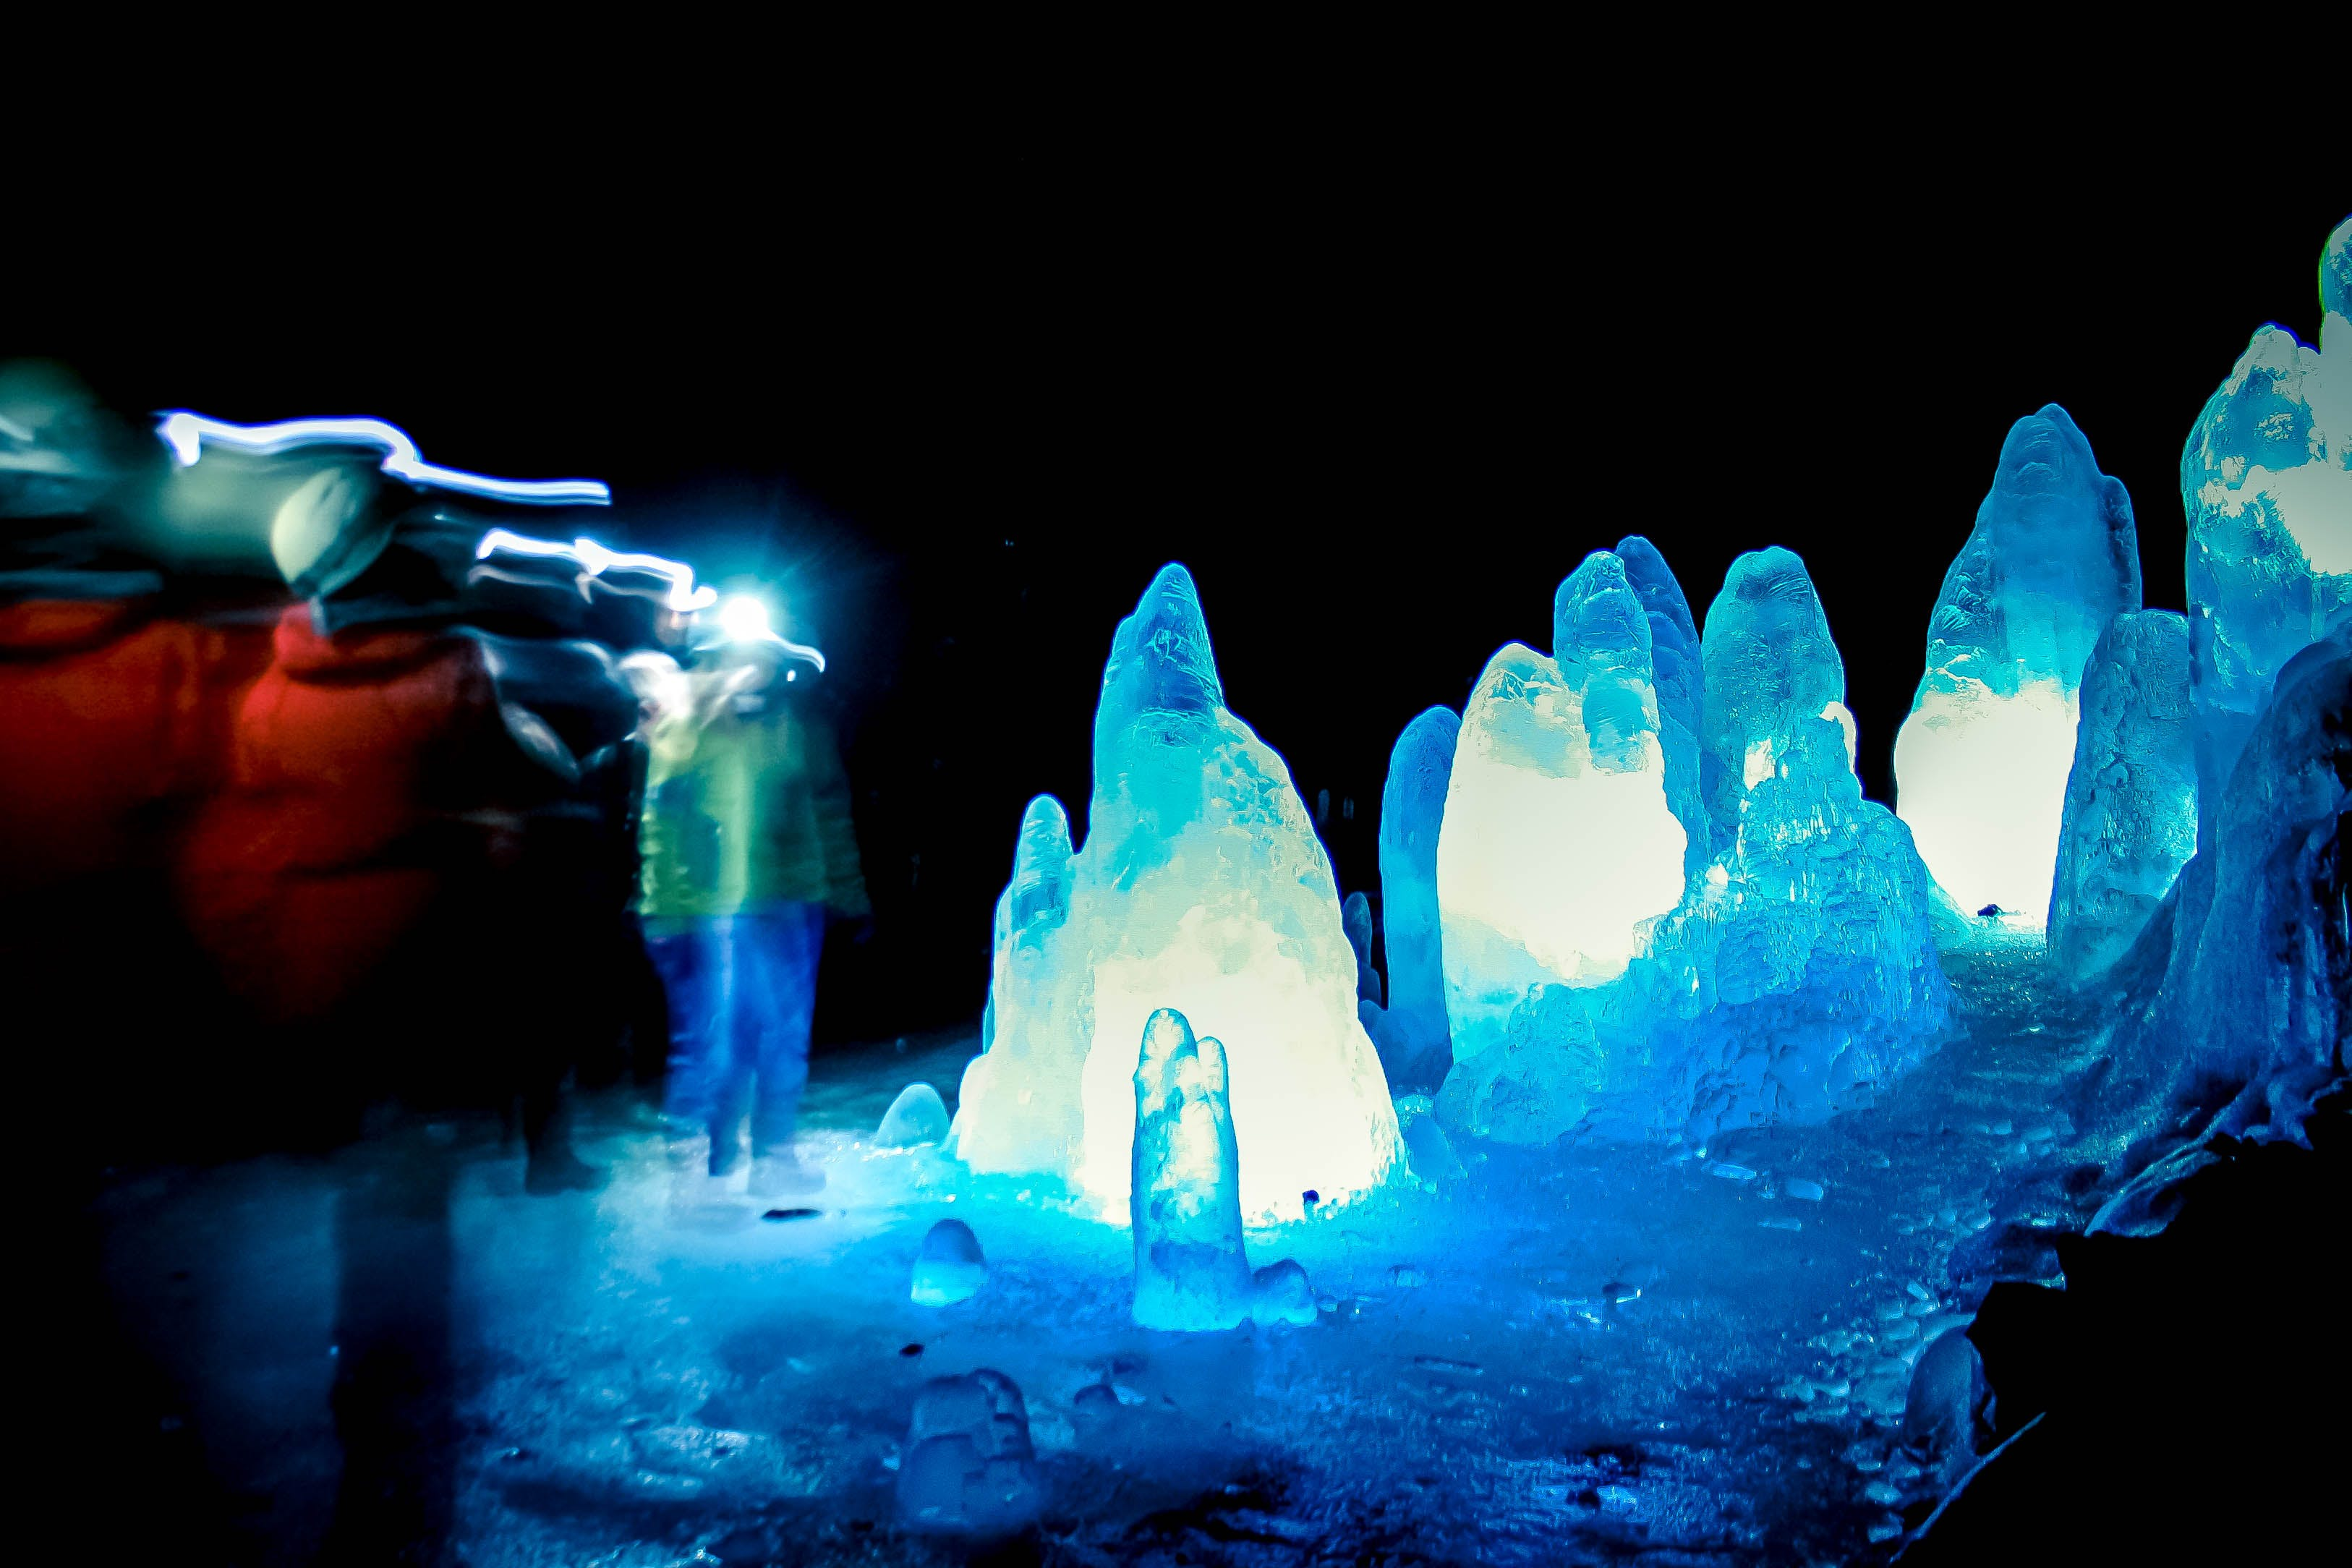 Winter Caving Tour to Lake Myvatn Ice Cave from Akureyri